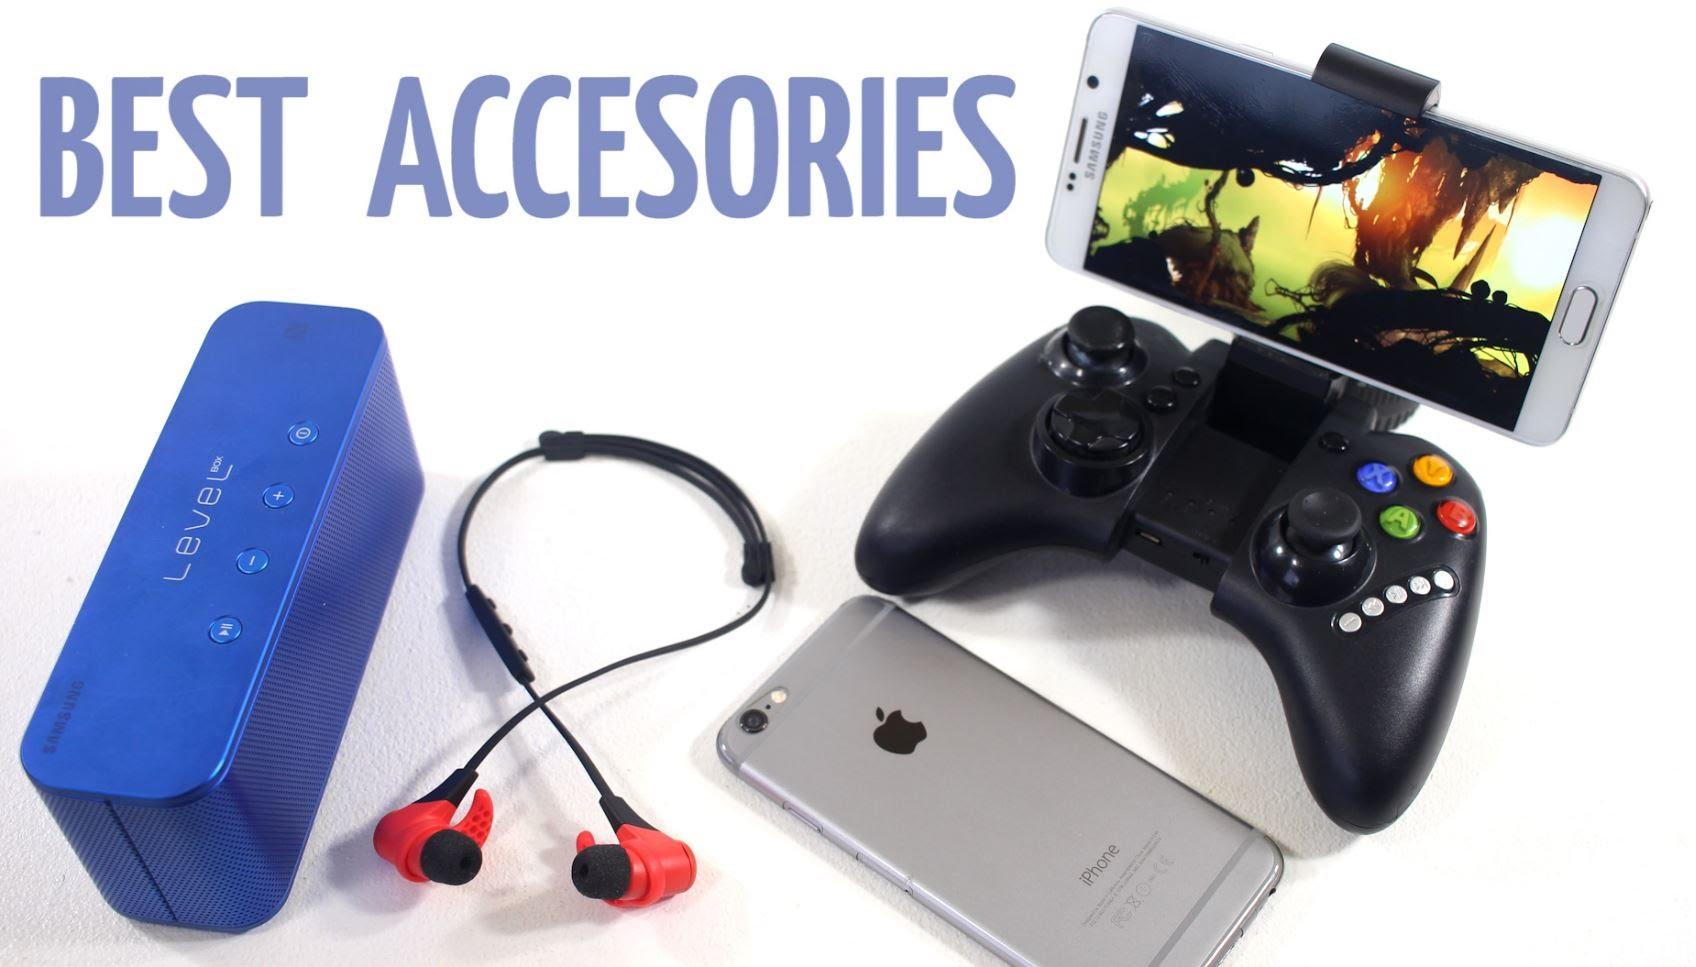 produkte unike per telefonat ne internet